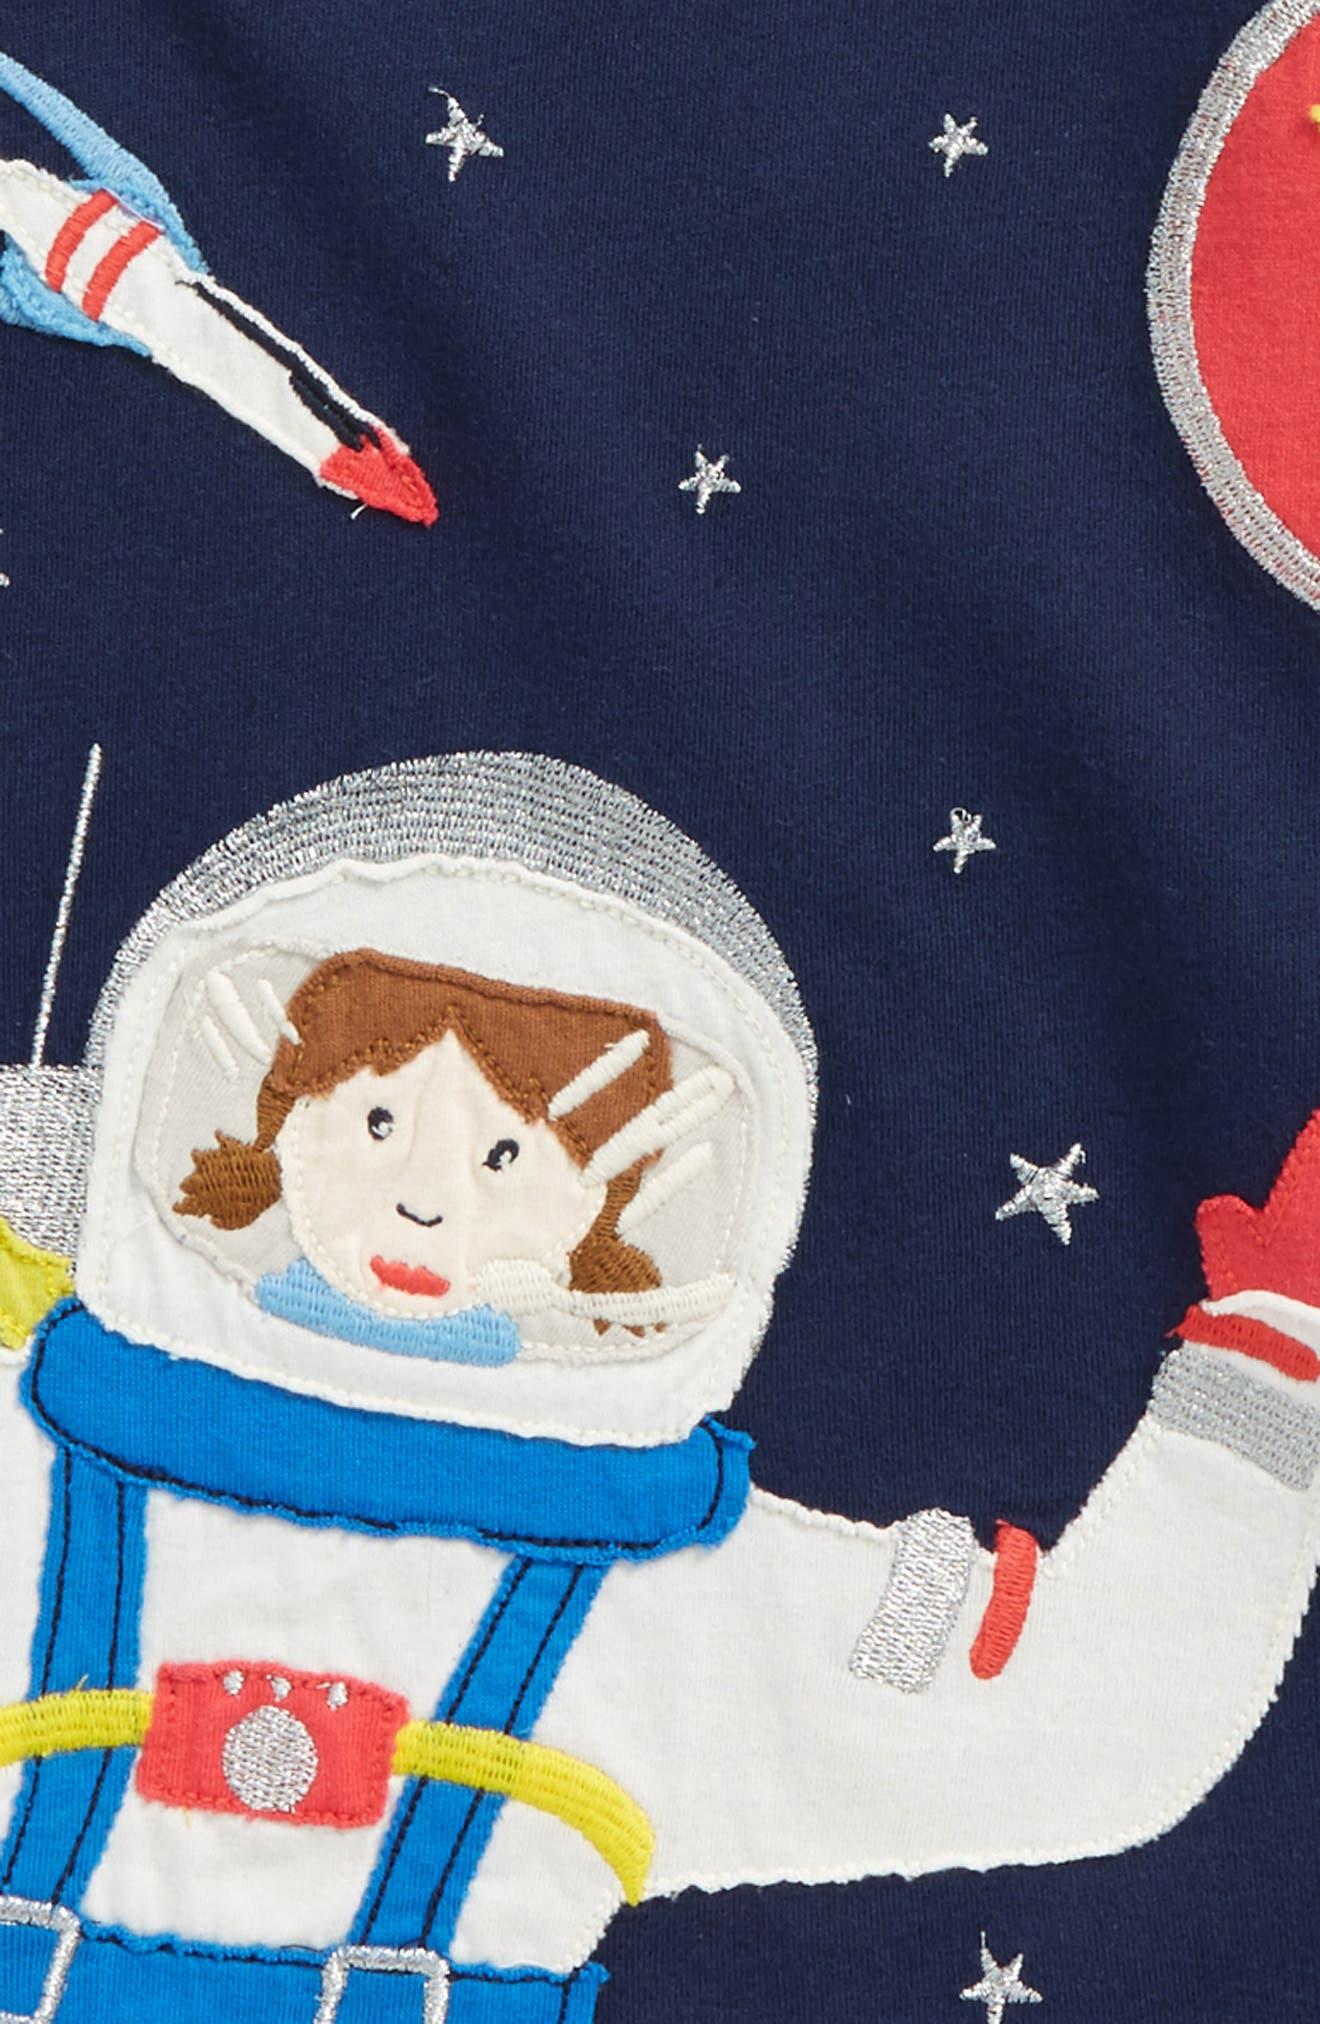 Space Girl Appliqué Tee,                             Alternate thumbnail 2, color,                             414